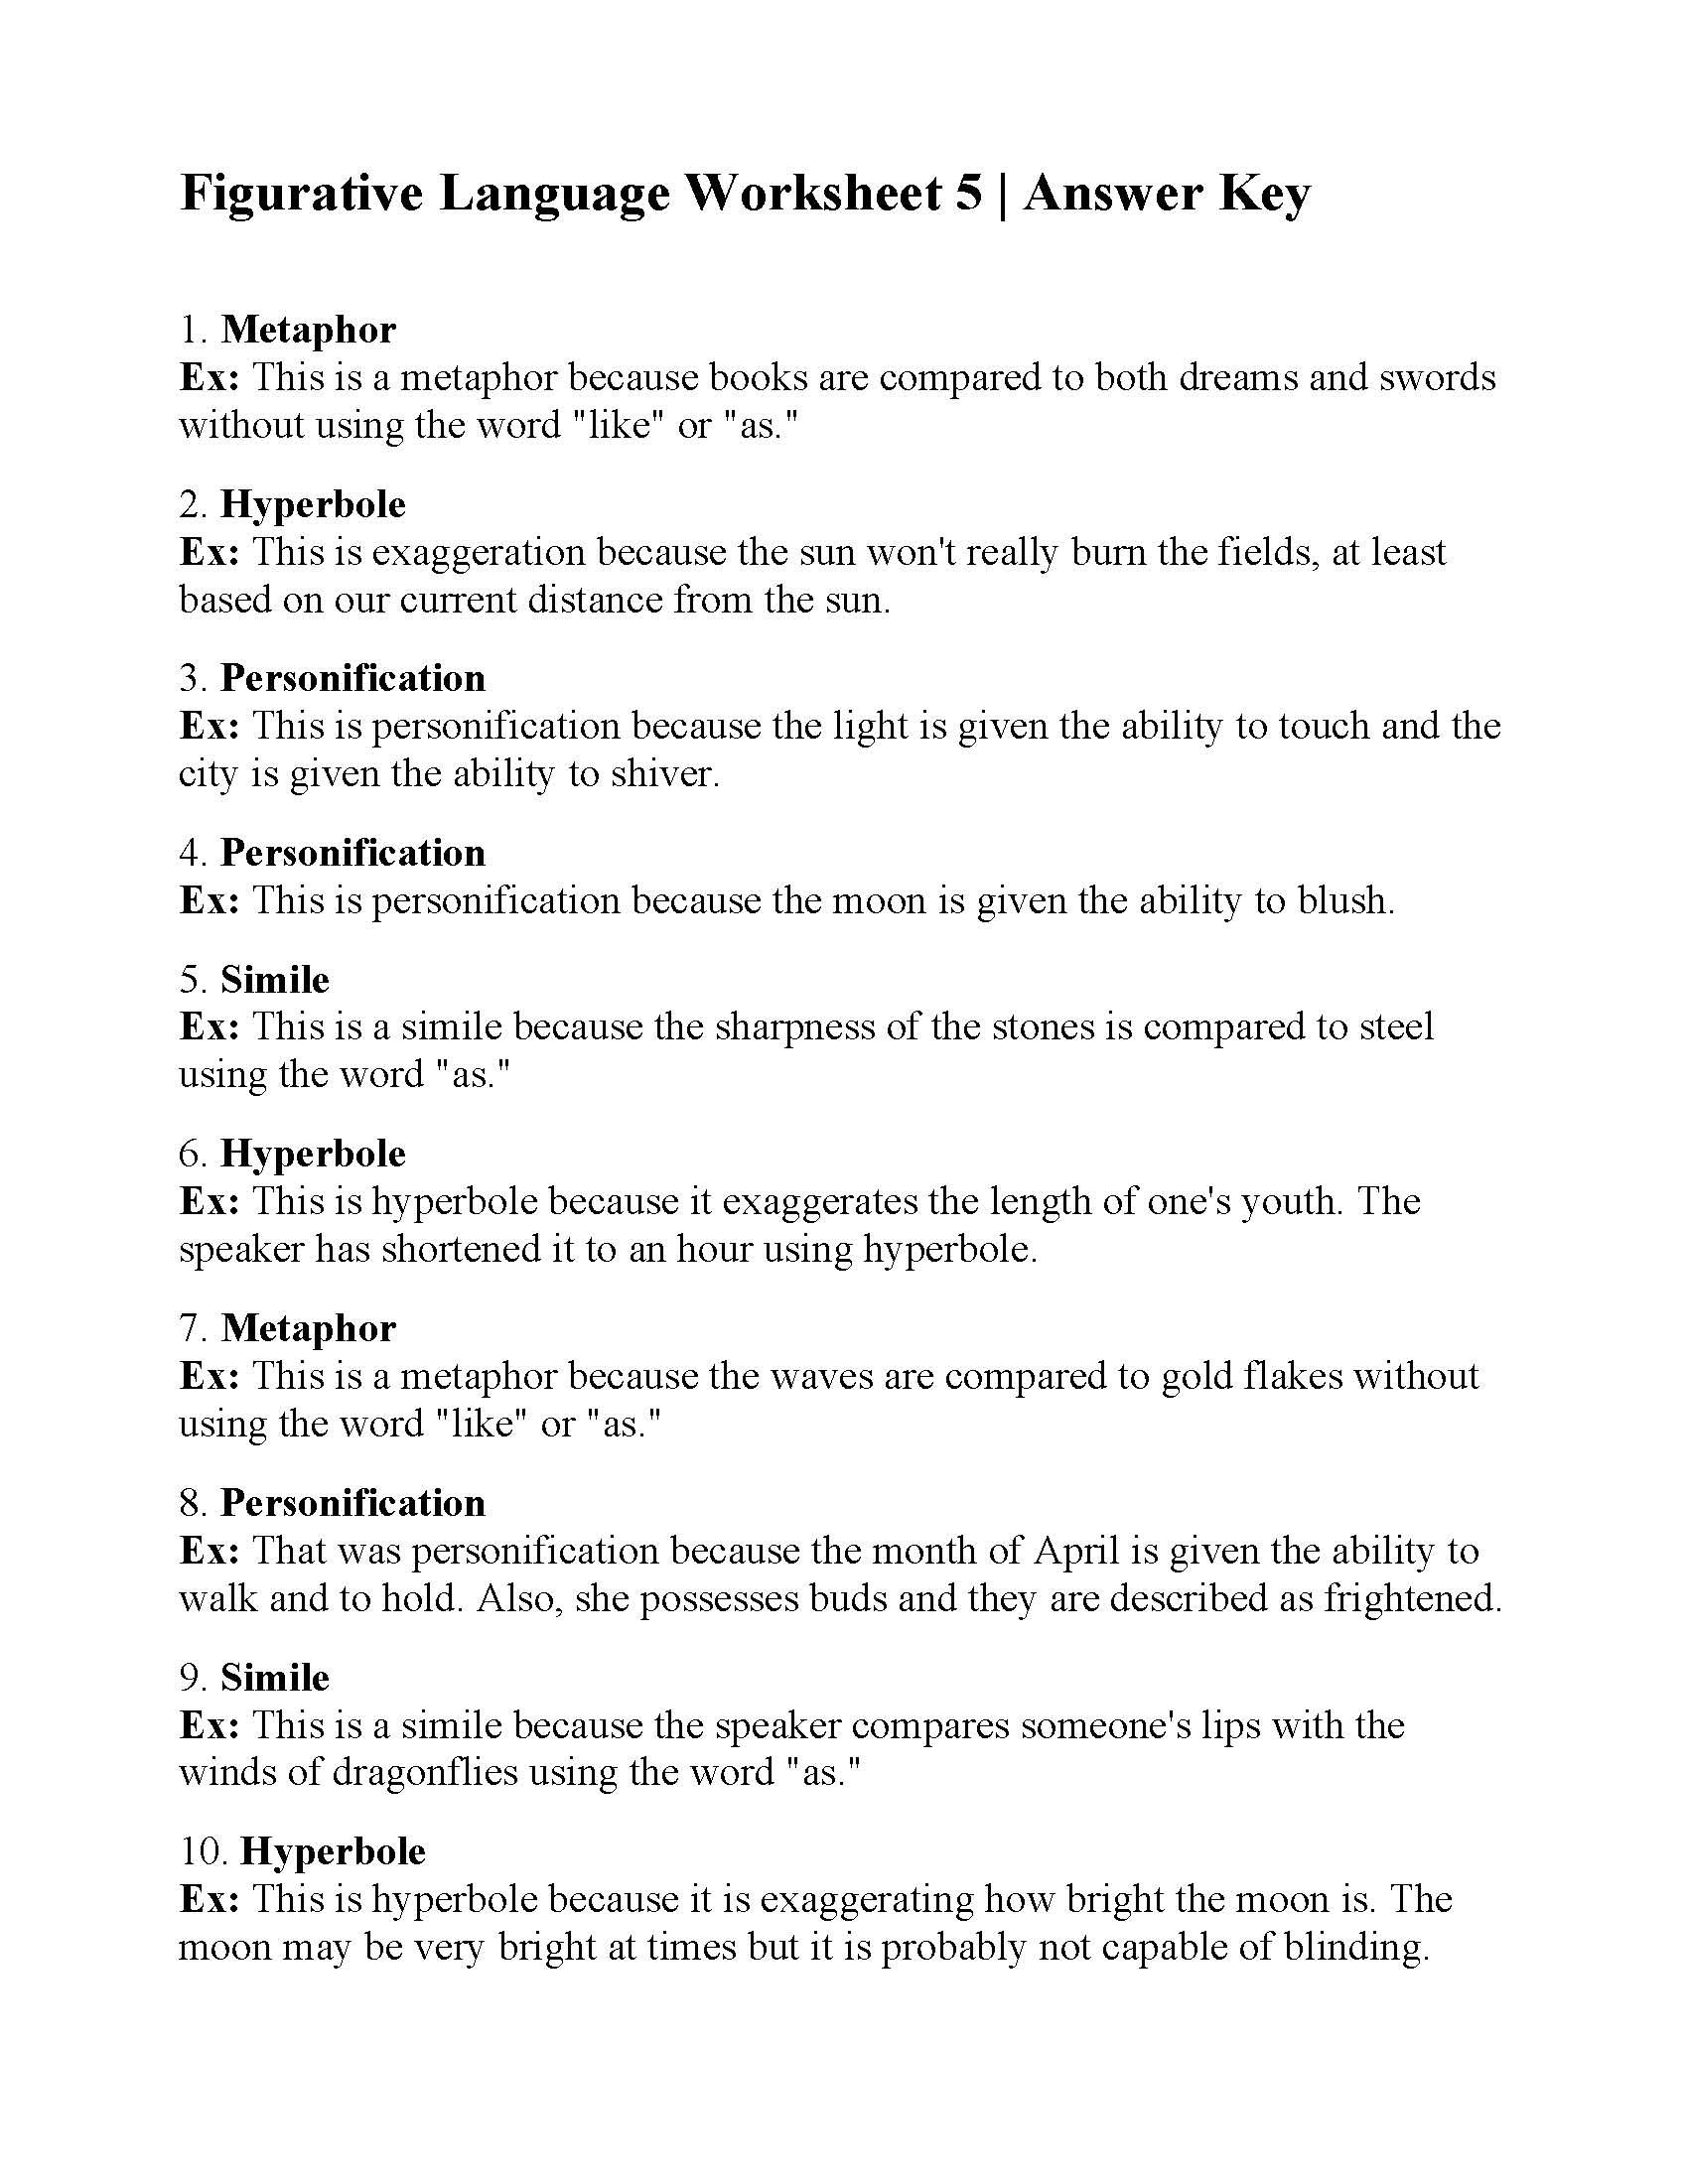 Figurative Language Worksheet 5 Ans Figurative Language Worksheet Language Worksheets Figurative Language [ 2200 x 1700 Pixel ]